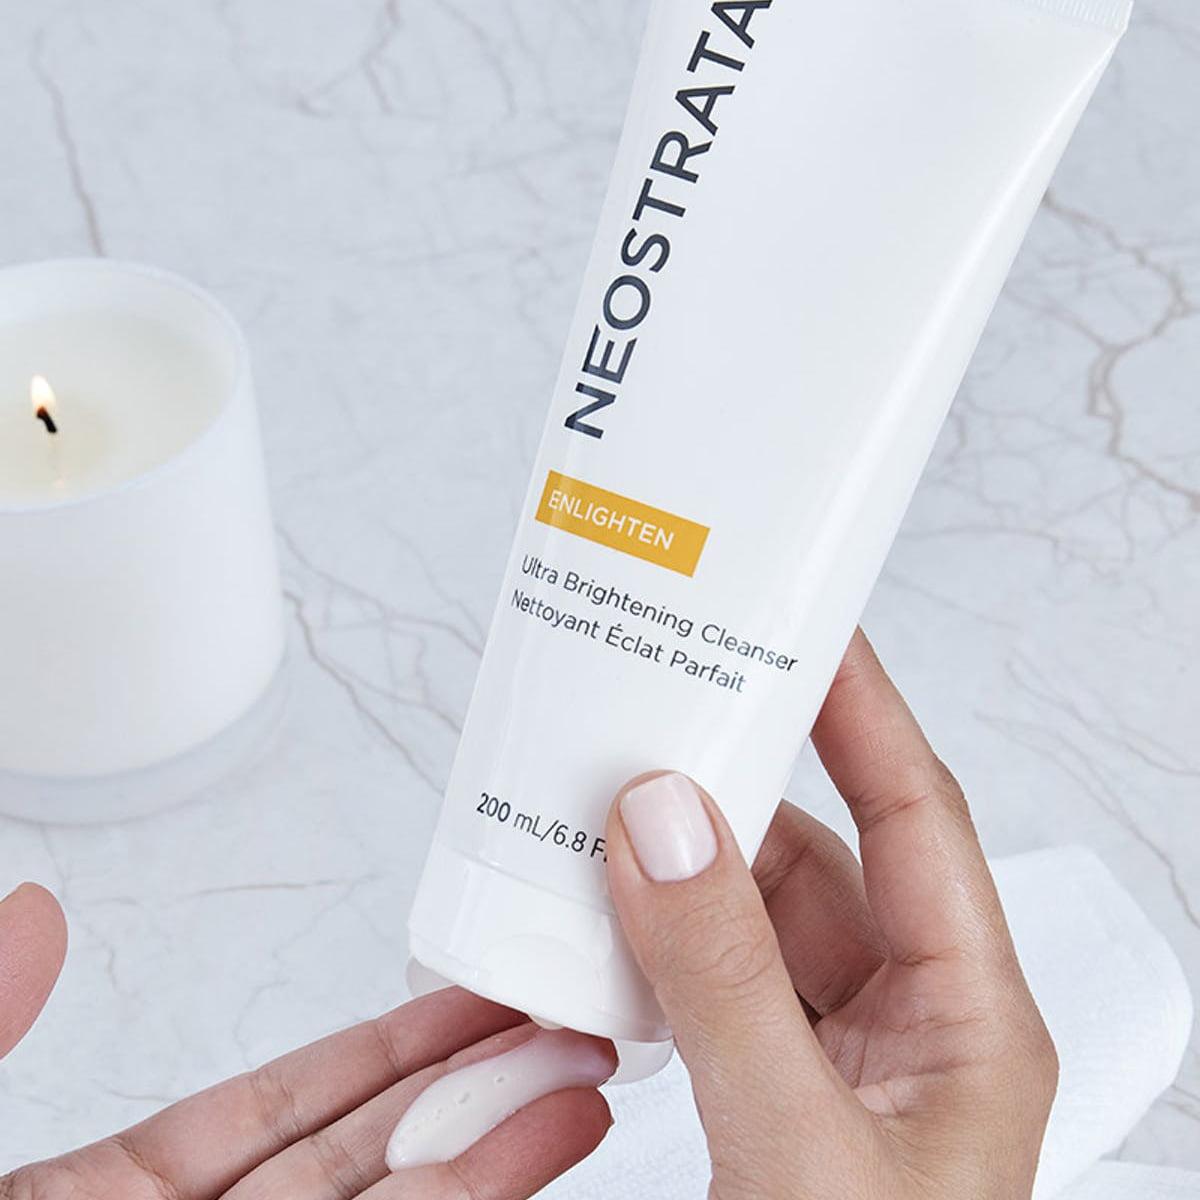 Sữa rửa mặt NeoStrata Enlighten Ultra Brightening Cleanser dạng sữa mềm, sạch da, sáng da